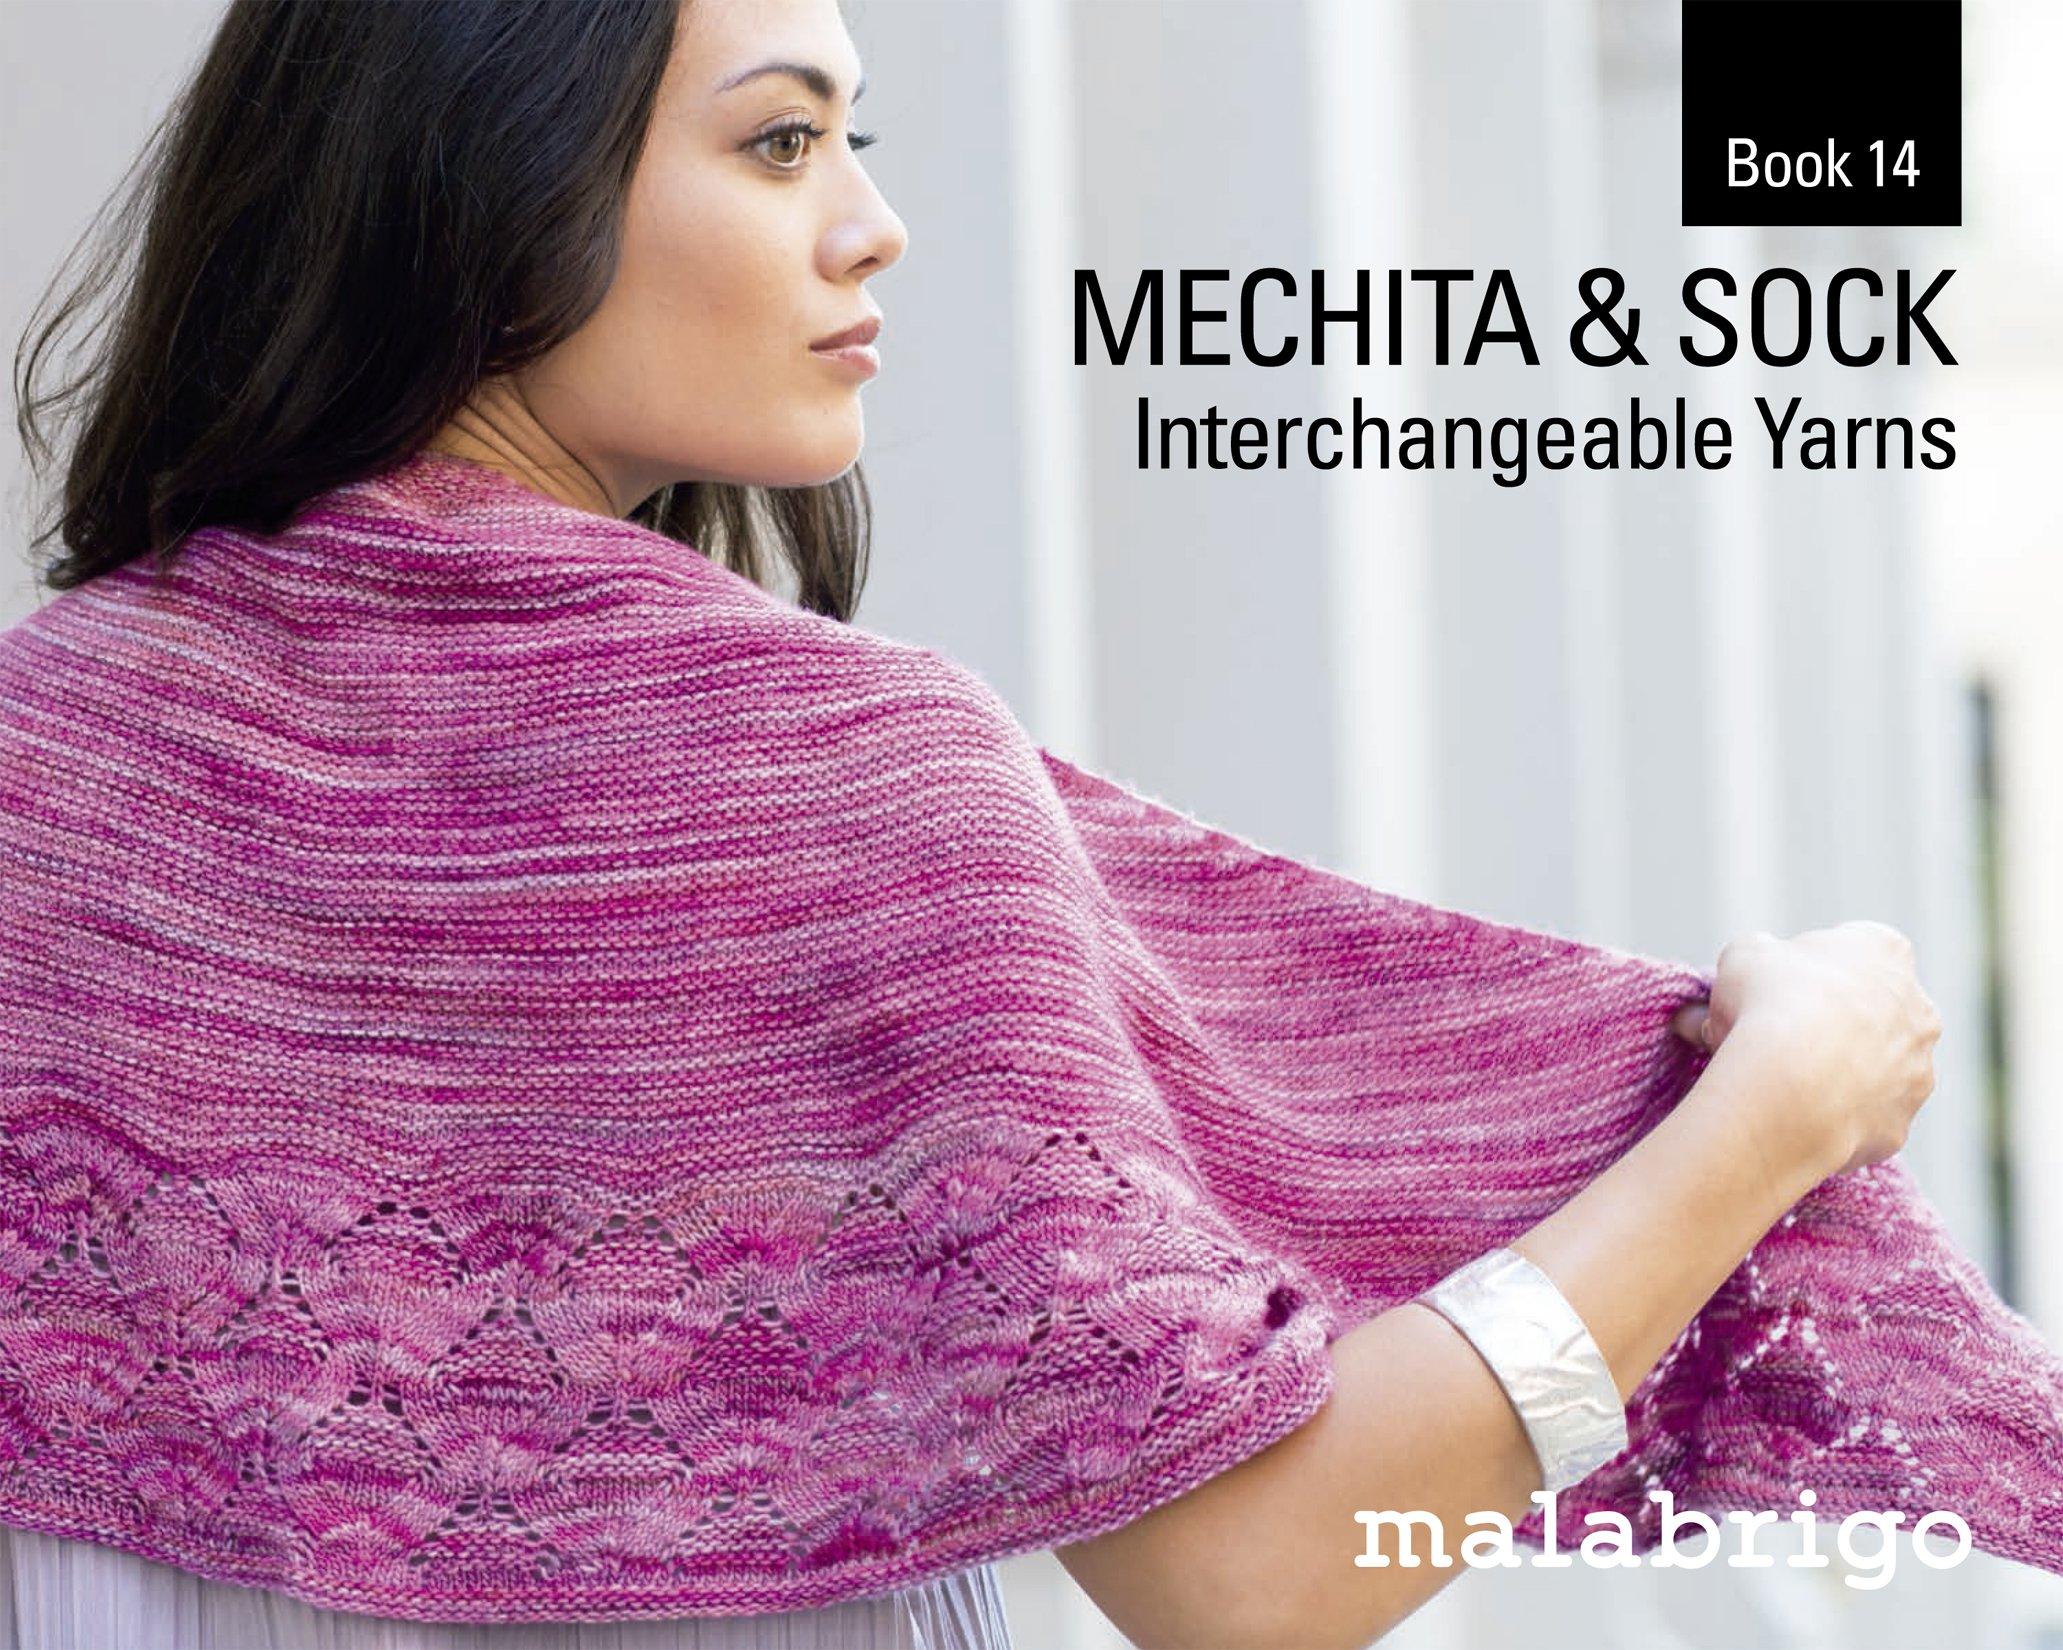 Malabrigo Book 14, Mechita and Sock